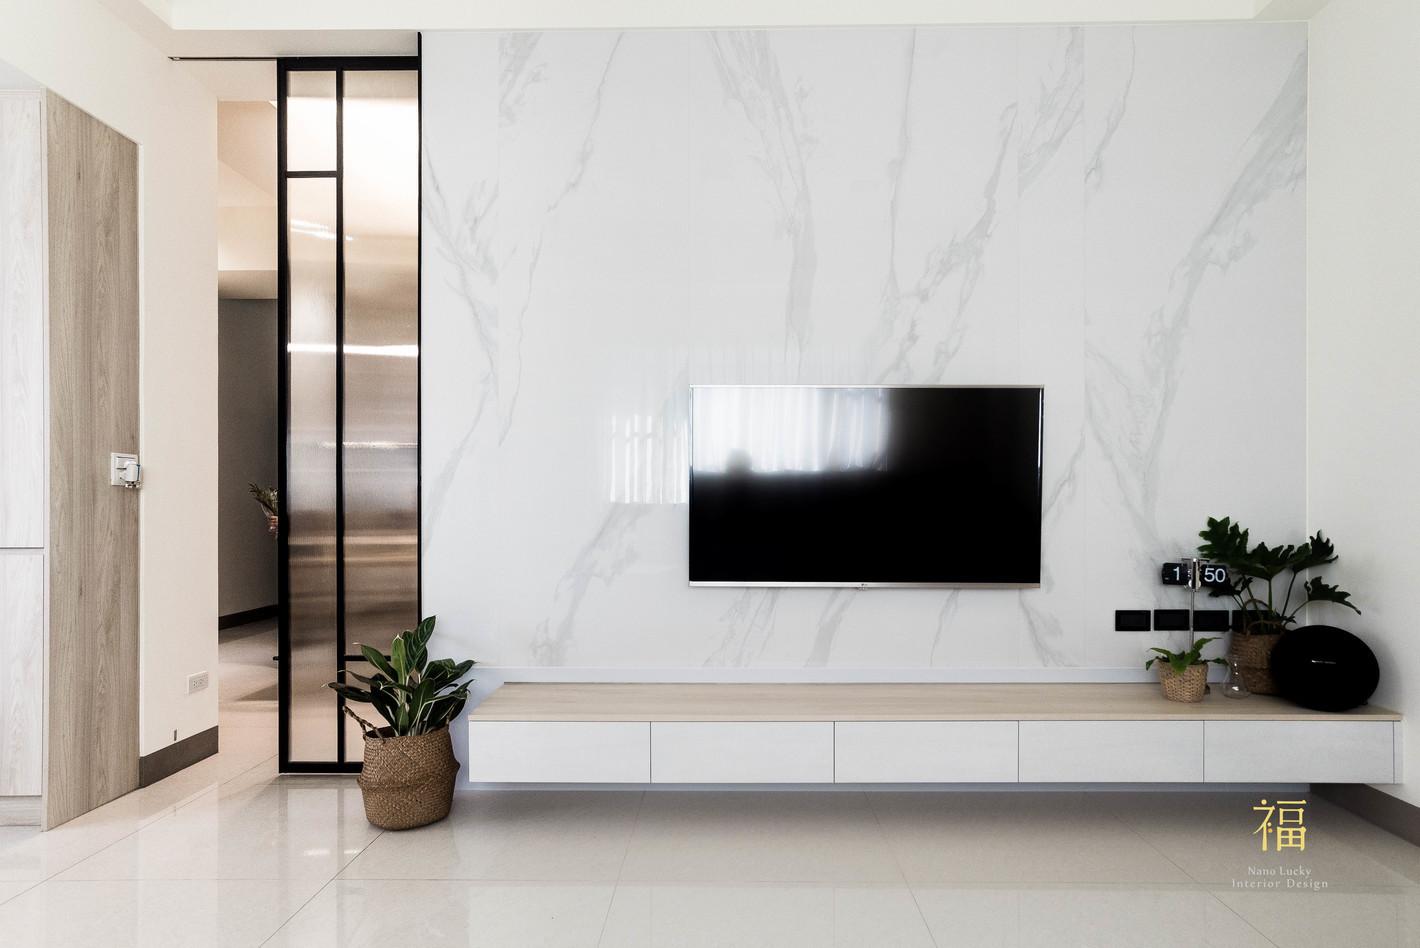 Nanolucky小福砌空間設計-敦煌五期A2-透天住宅設計-簡約北歐風-整面大理石電視牆